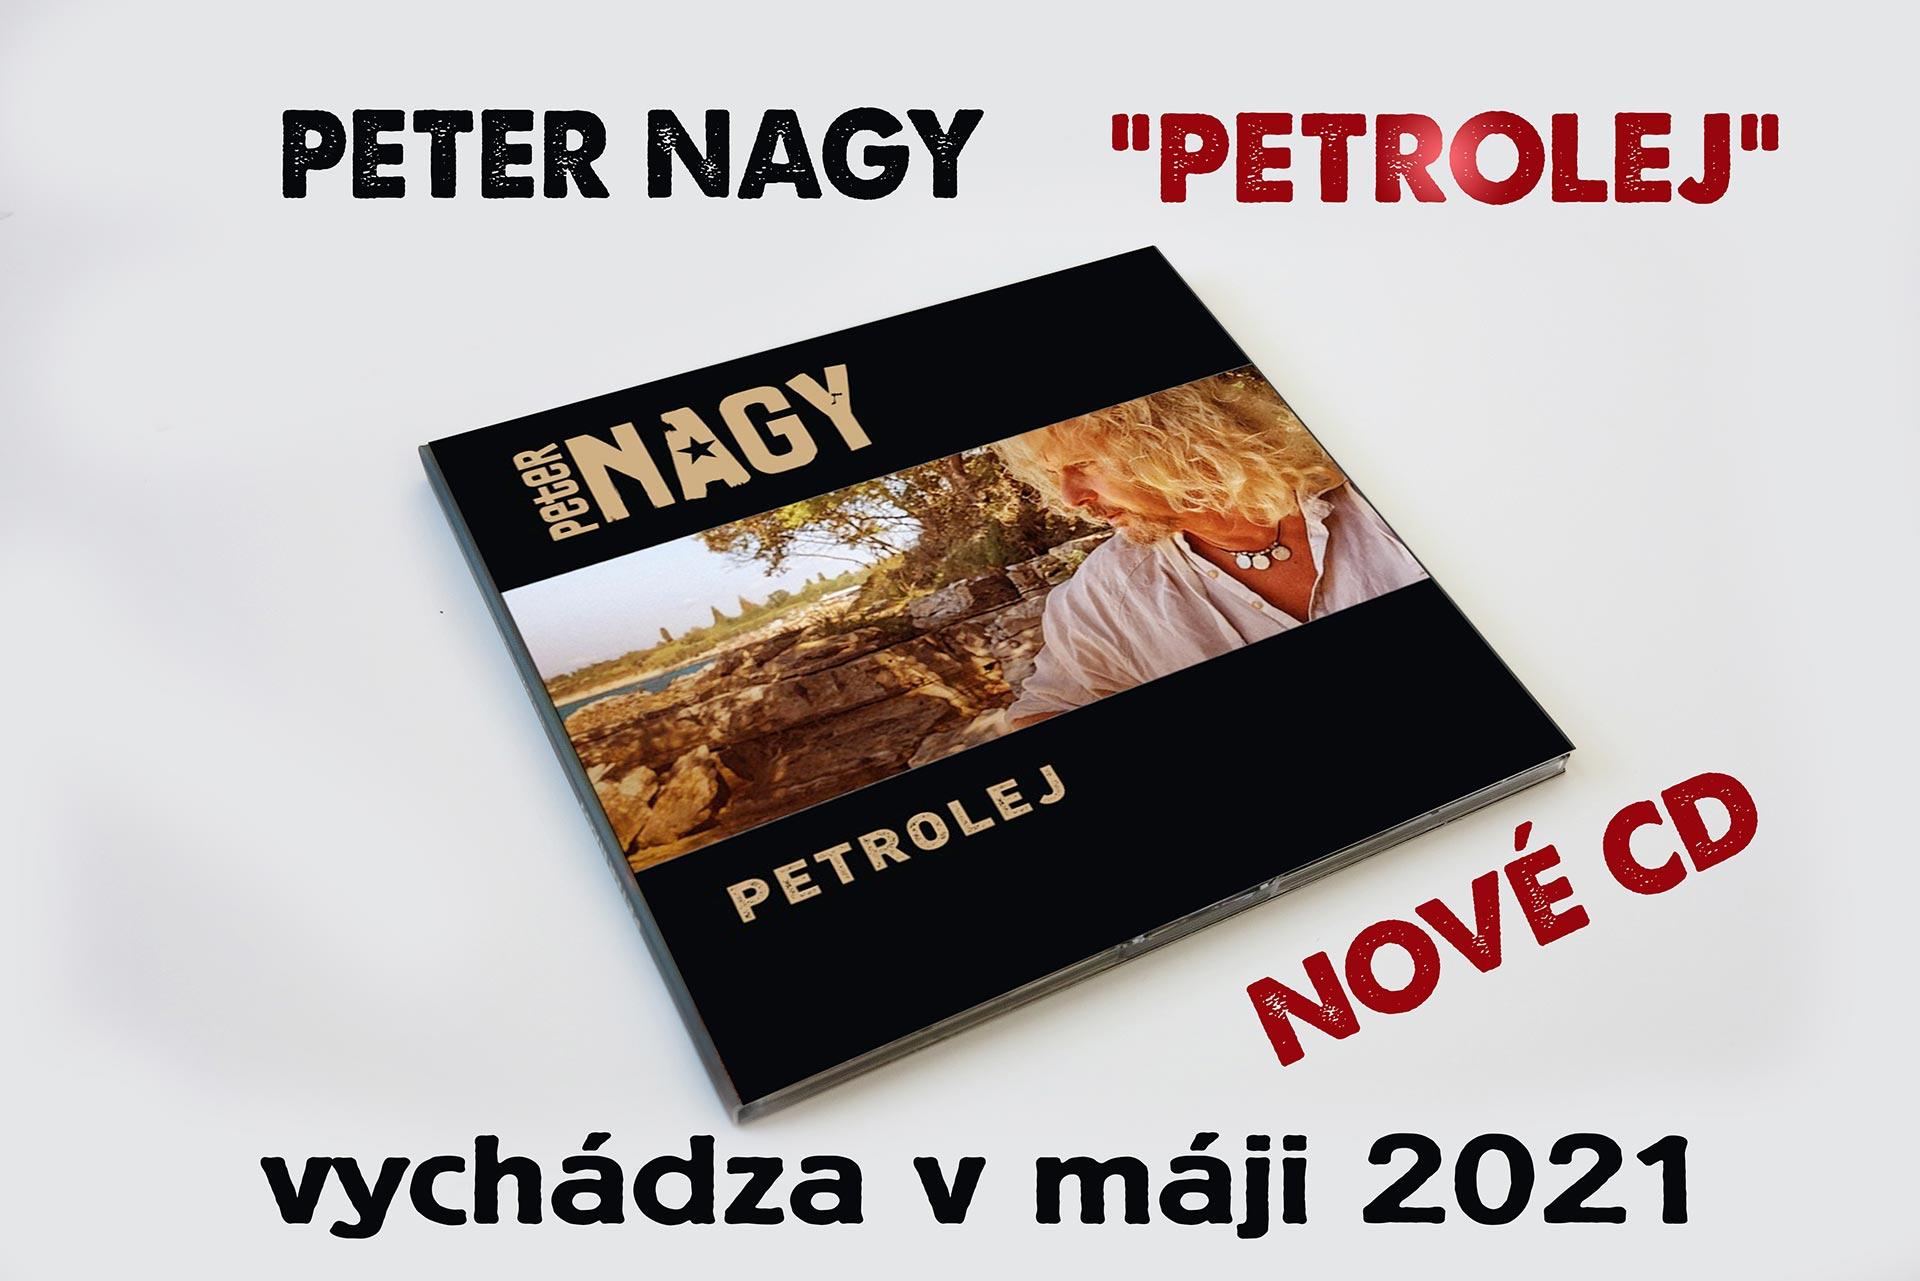 Peter Nagy Petrolej nové CD